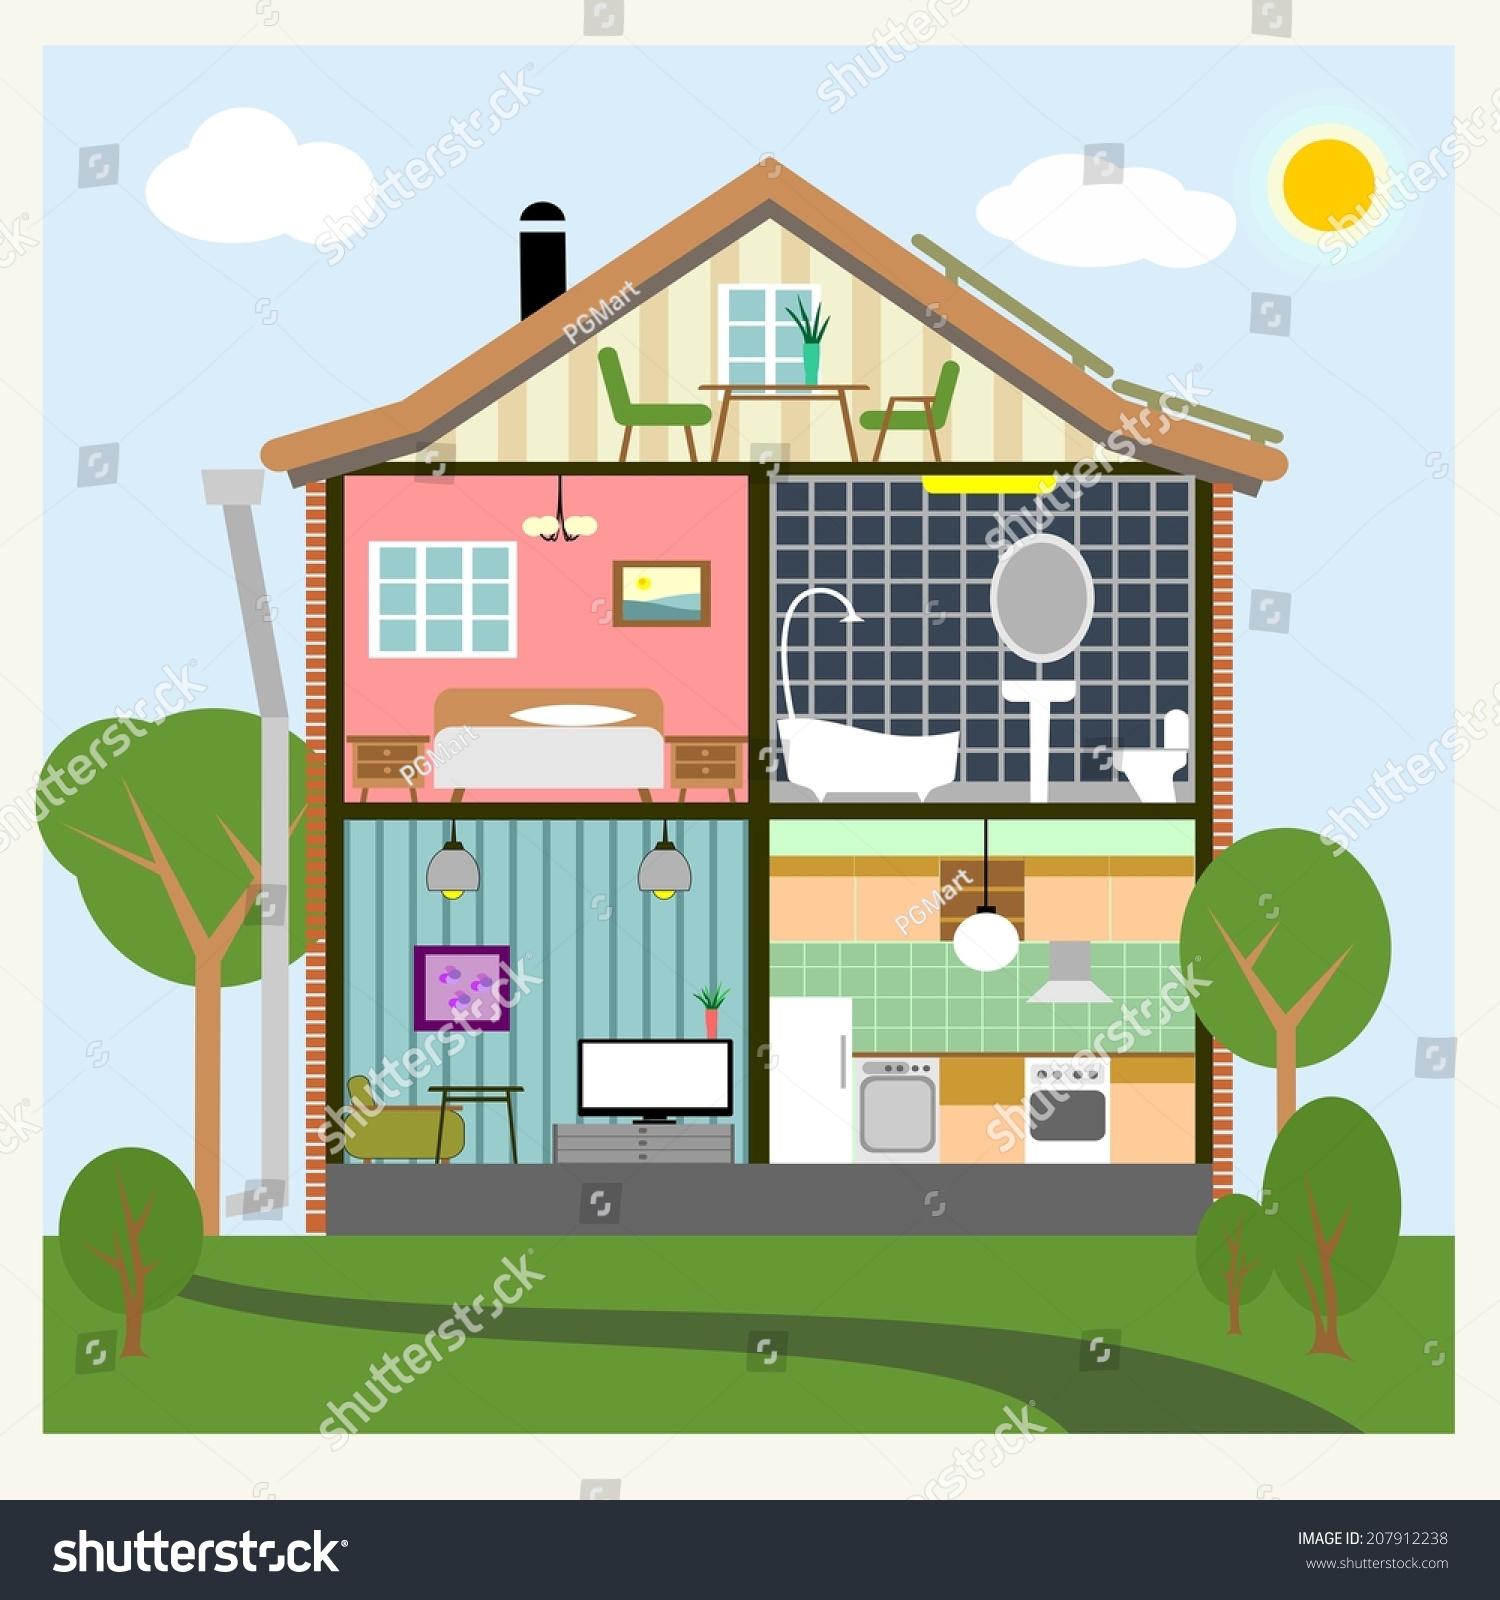 home interior clipart - photo #15